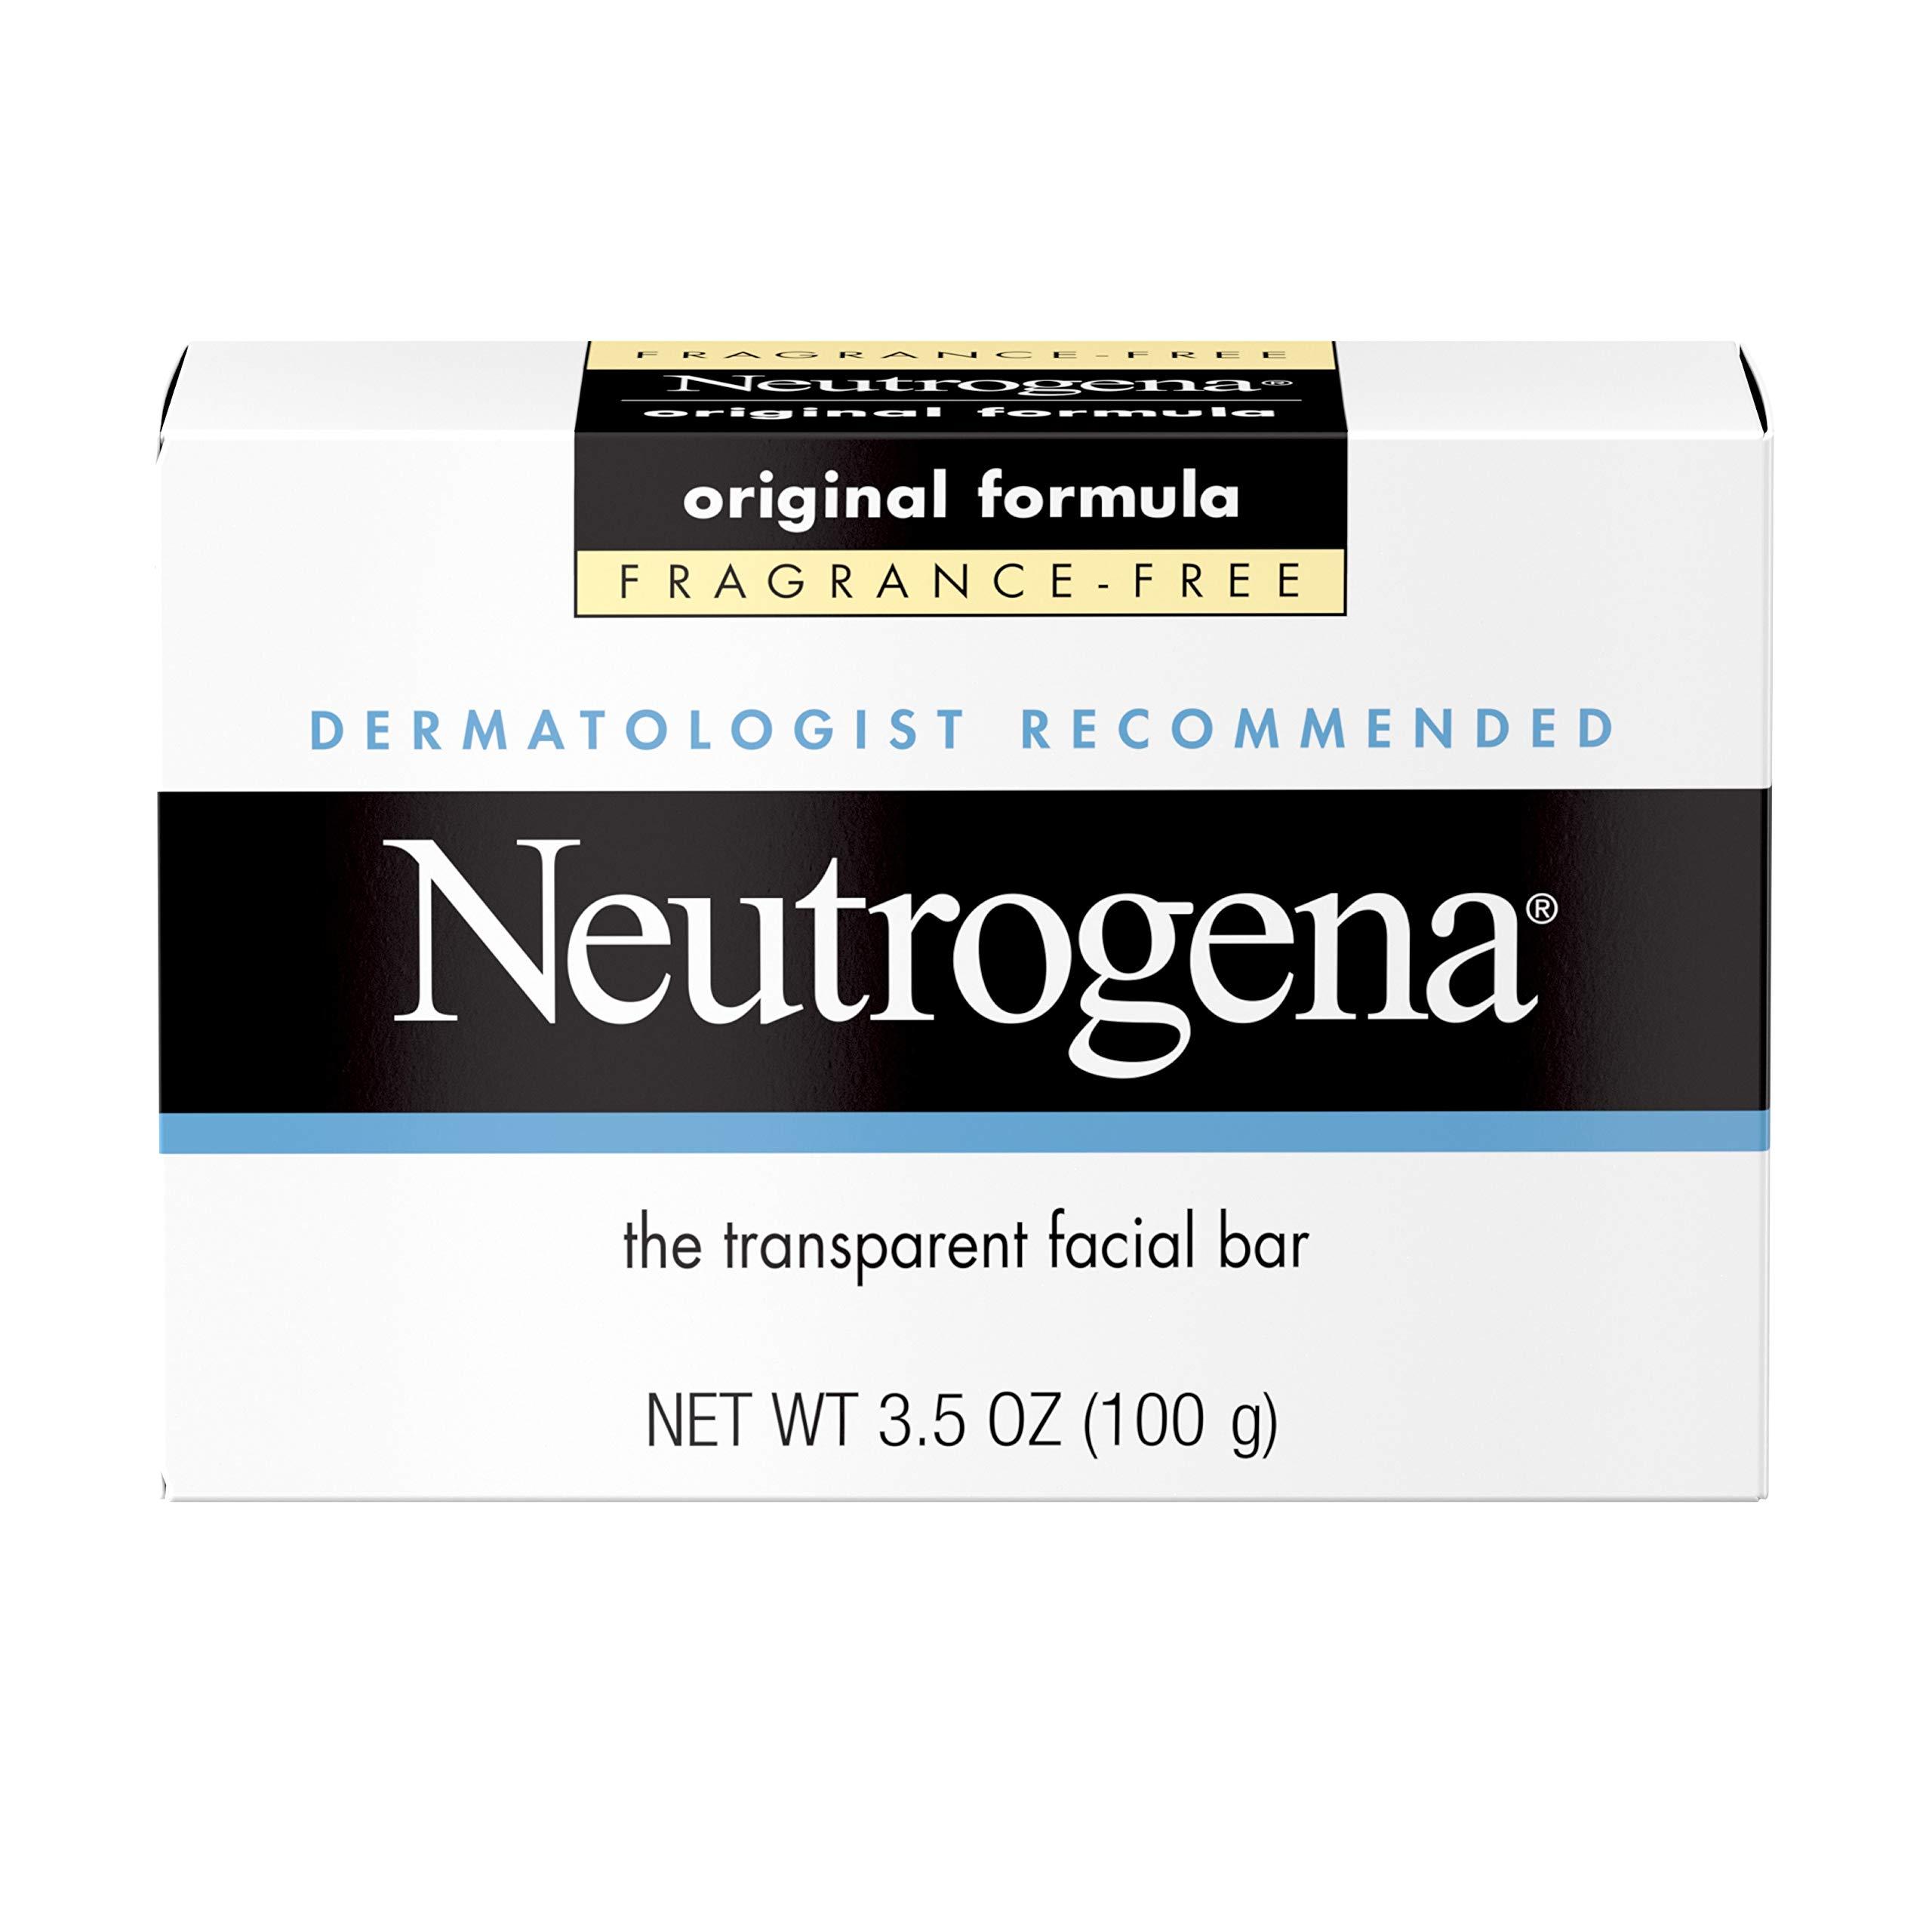 Neutrogena Original Fragrance-Free Facial Cleansing Bar